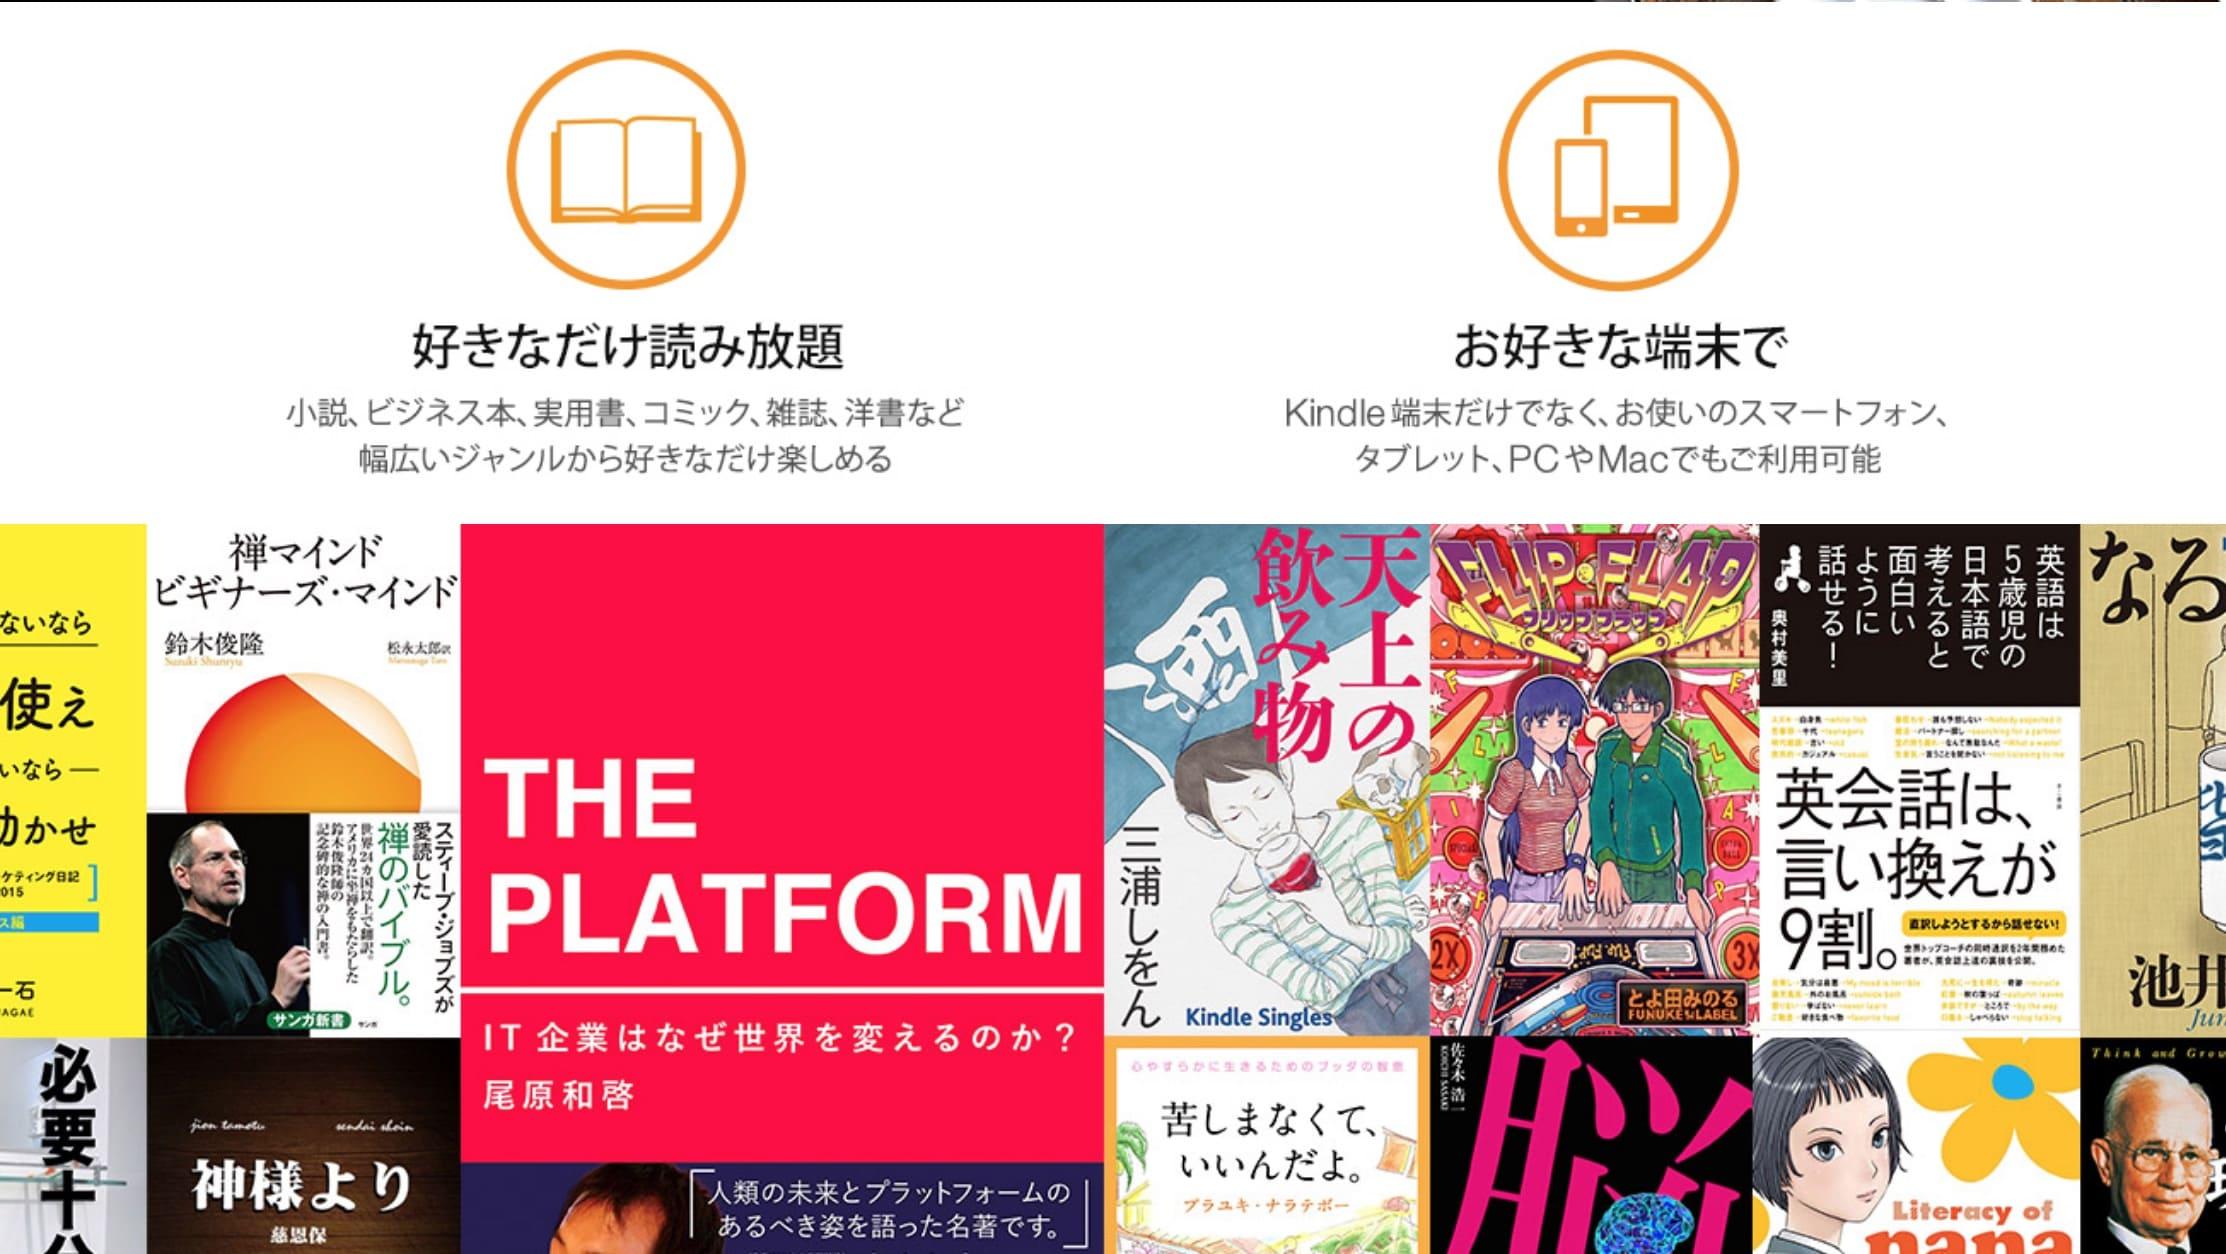 Kindle Unlimitedとは?料金・メリット・デメリット・おすすめの本を紹介!